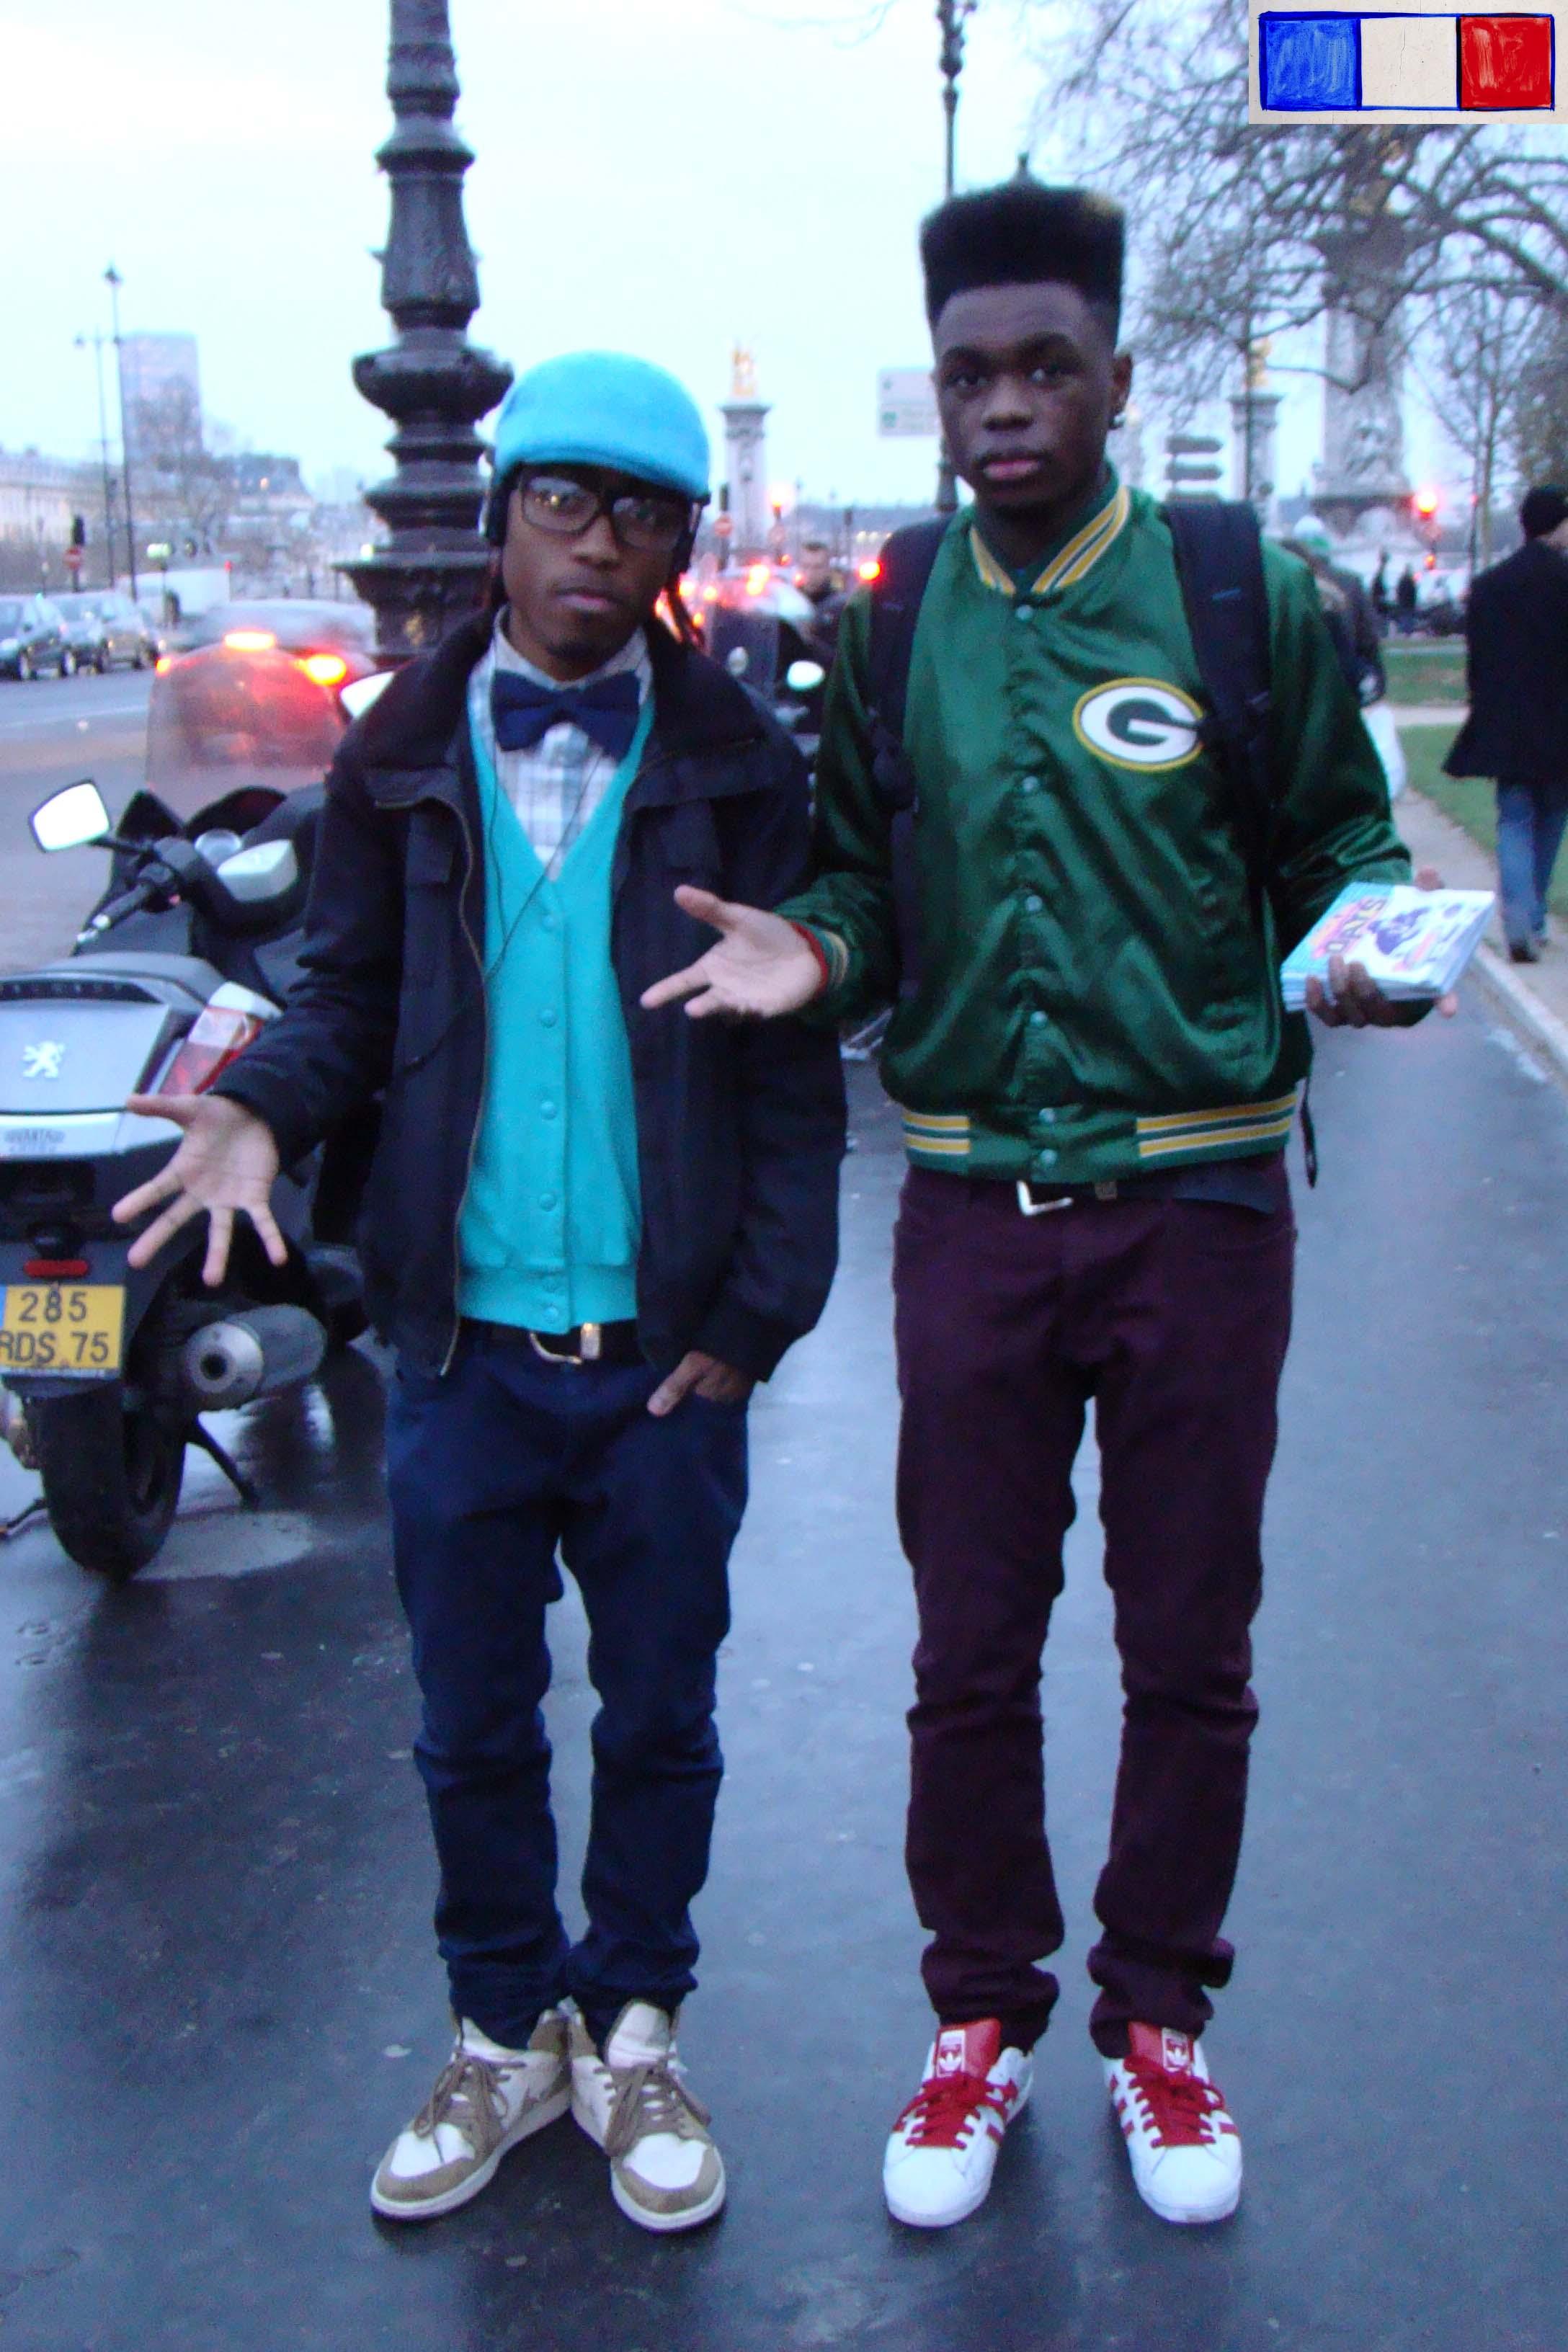 Hip hop fashion - Wikipedia 13